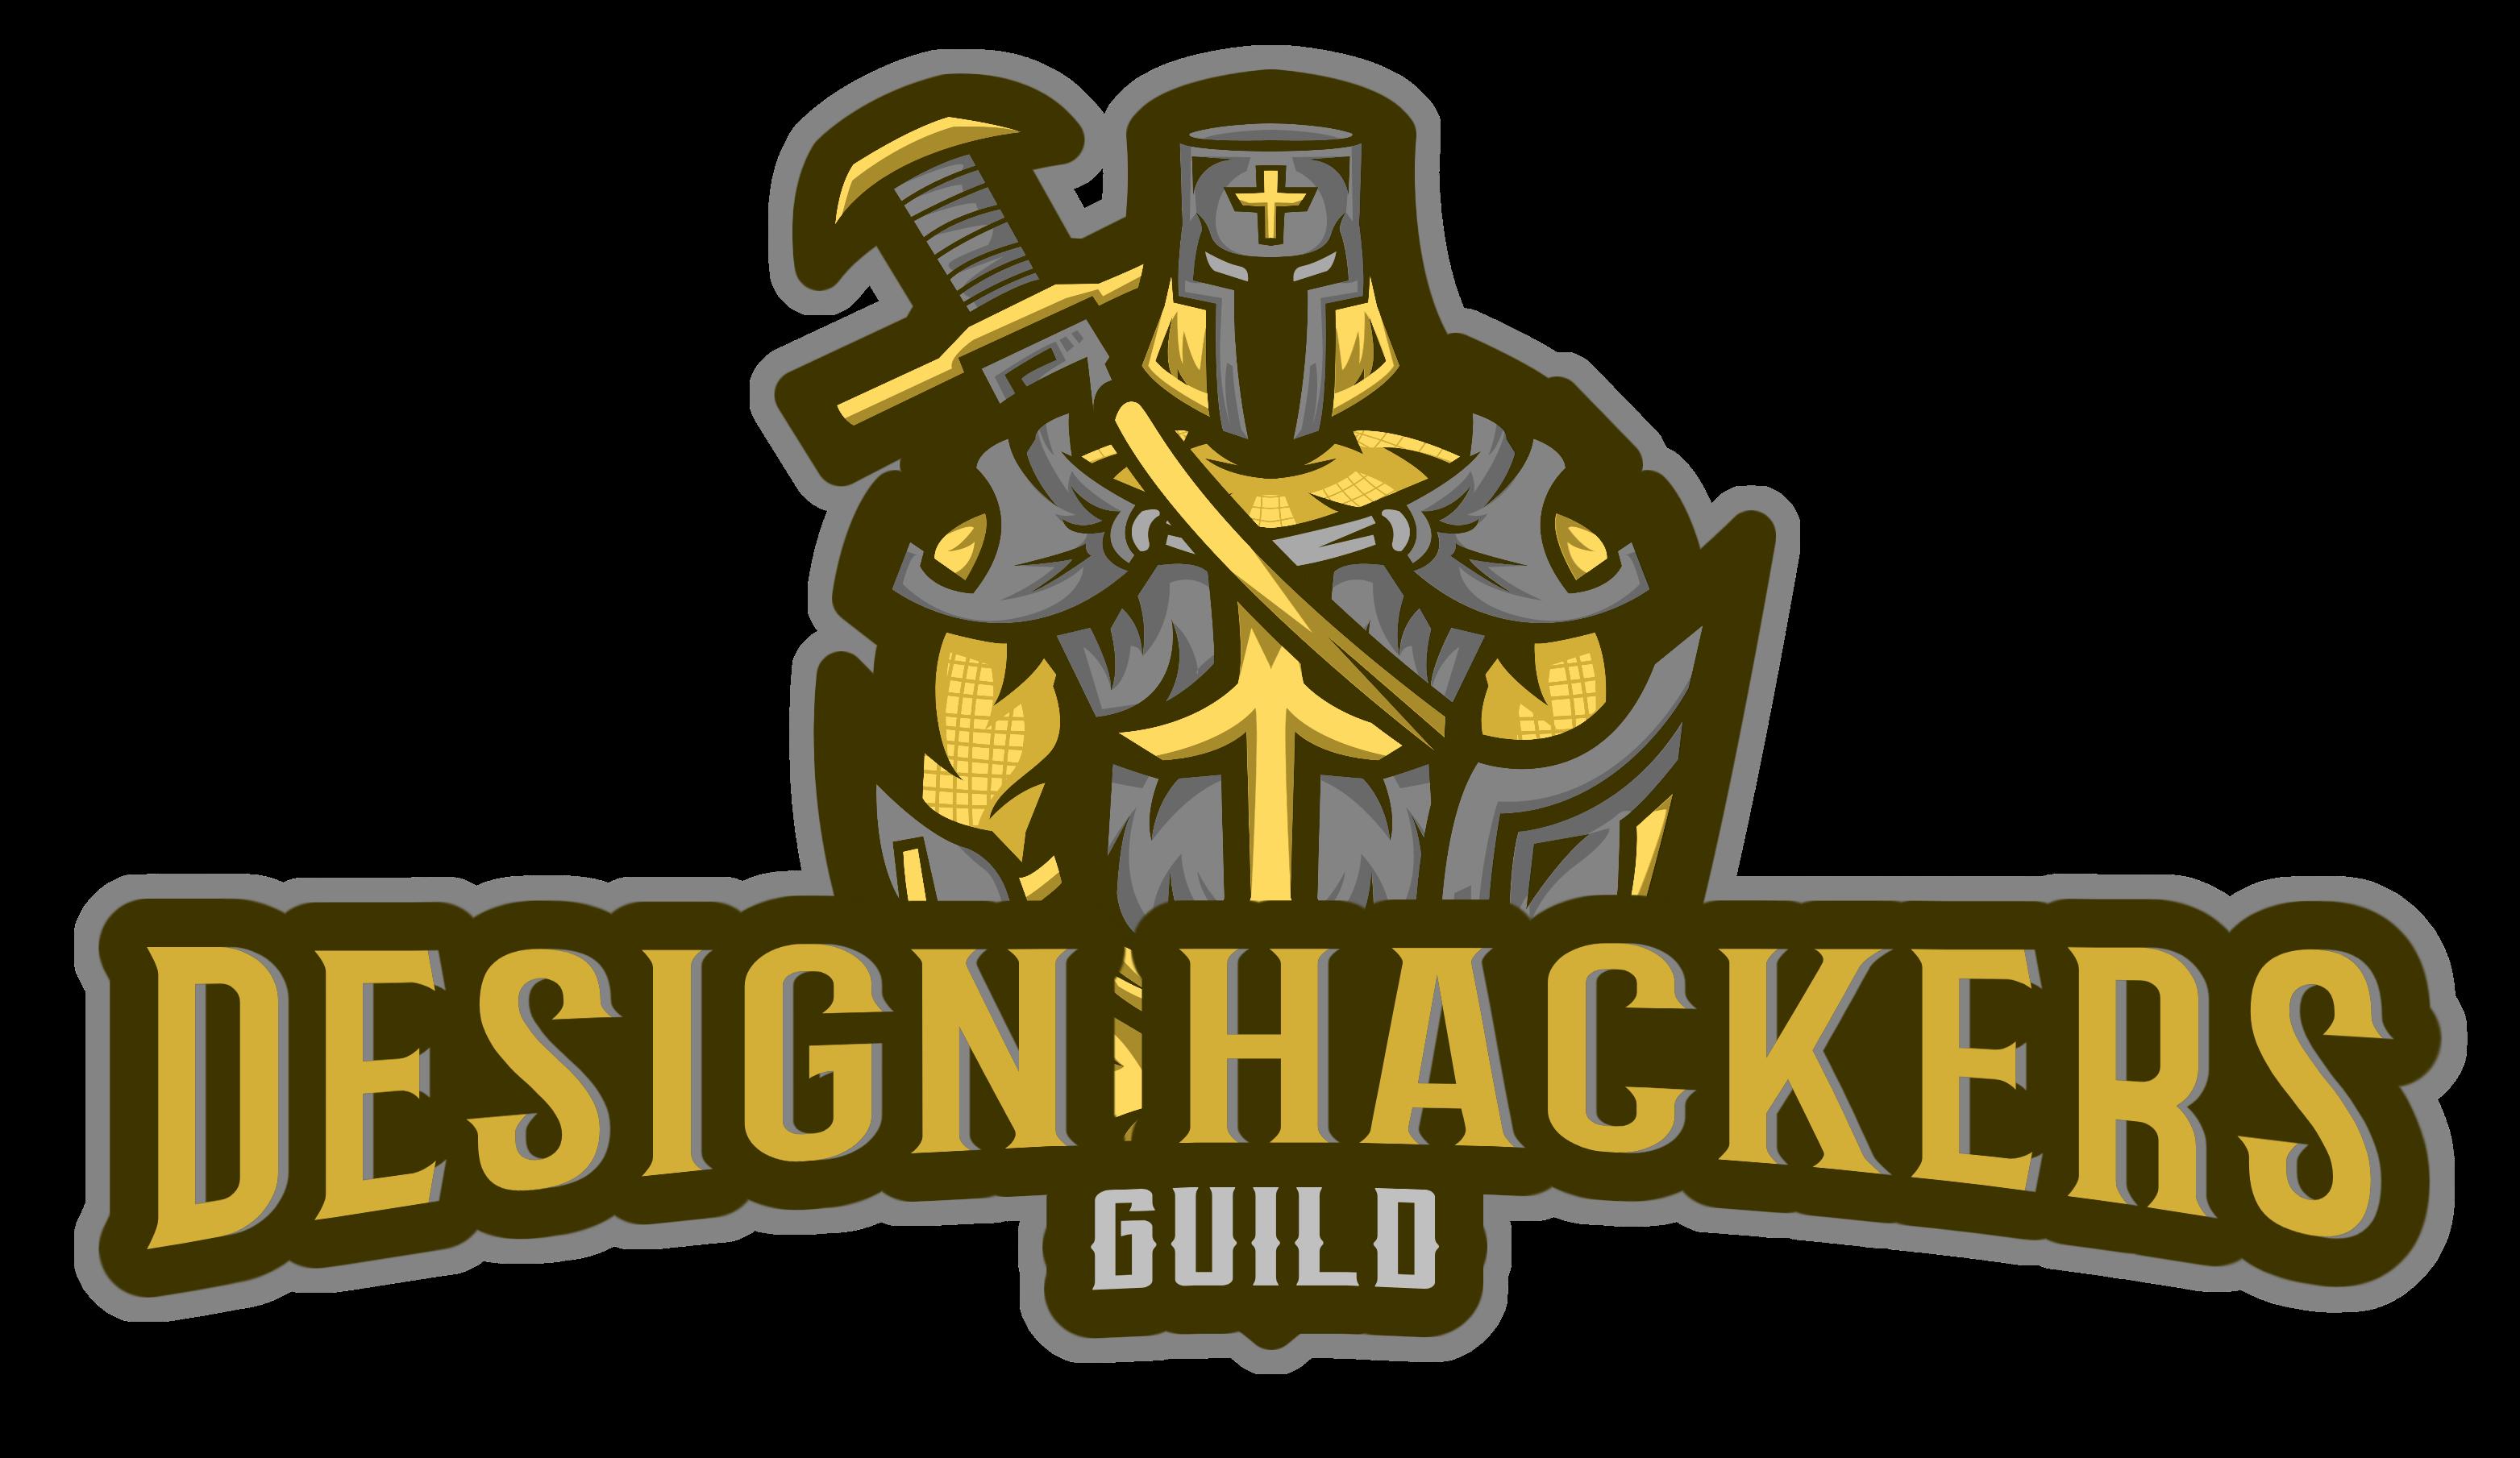 Design Hackers Guild